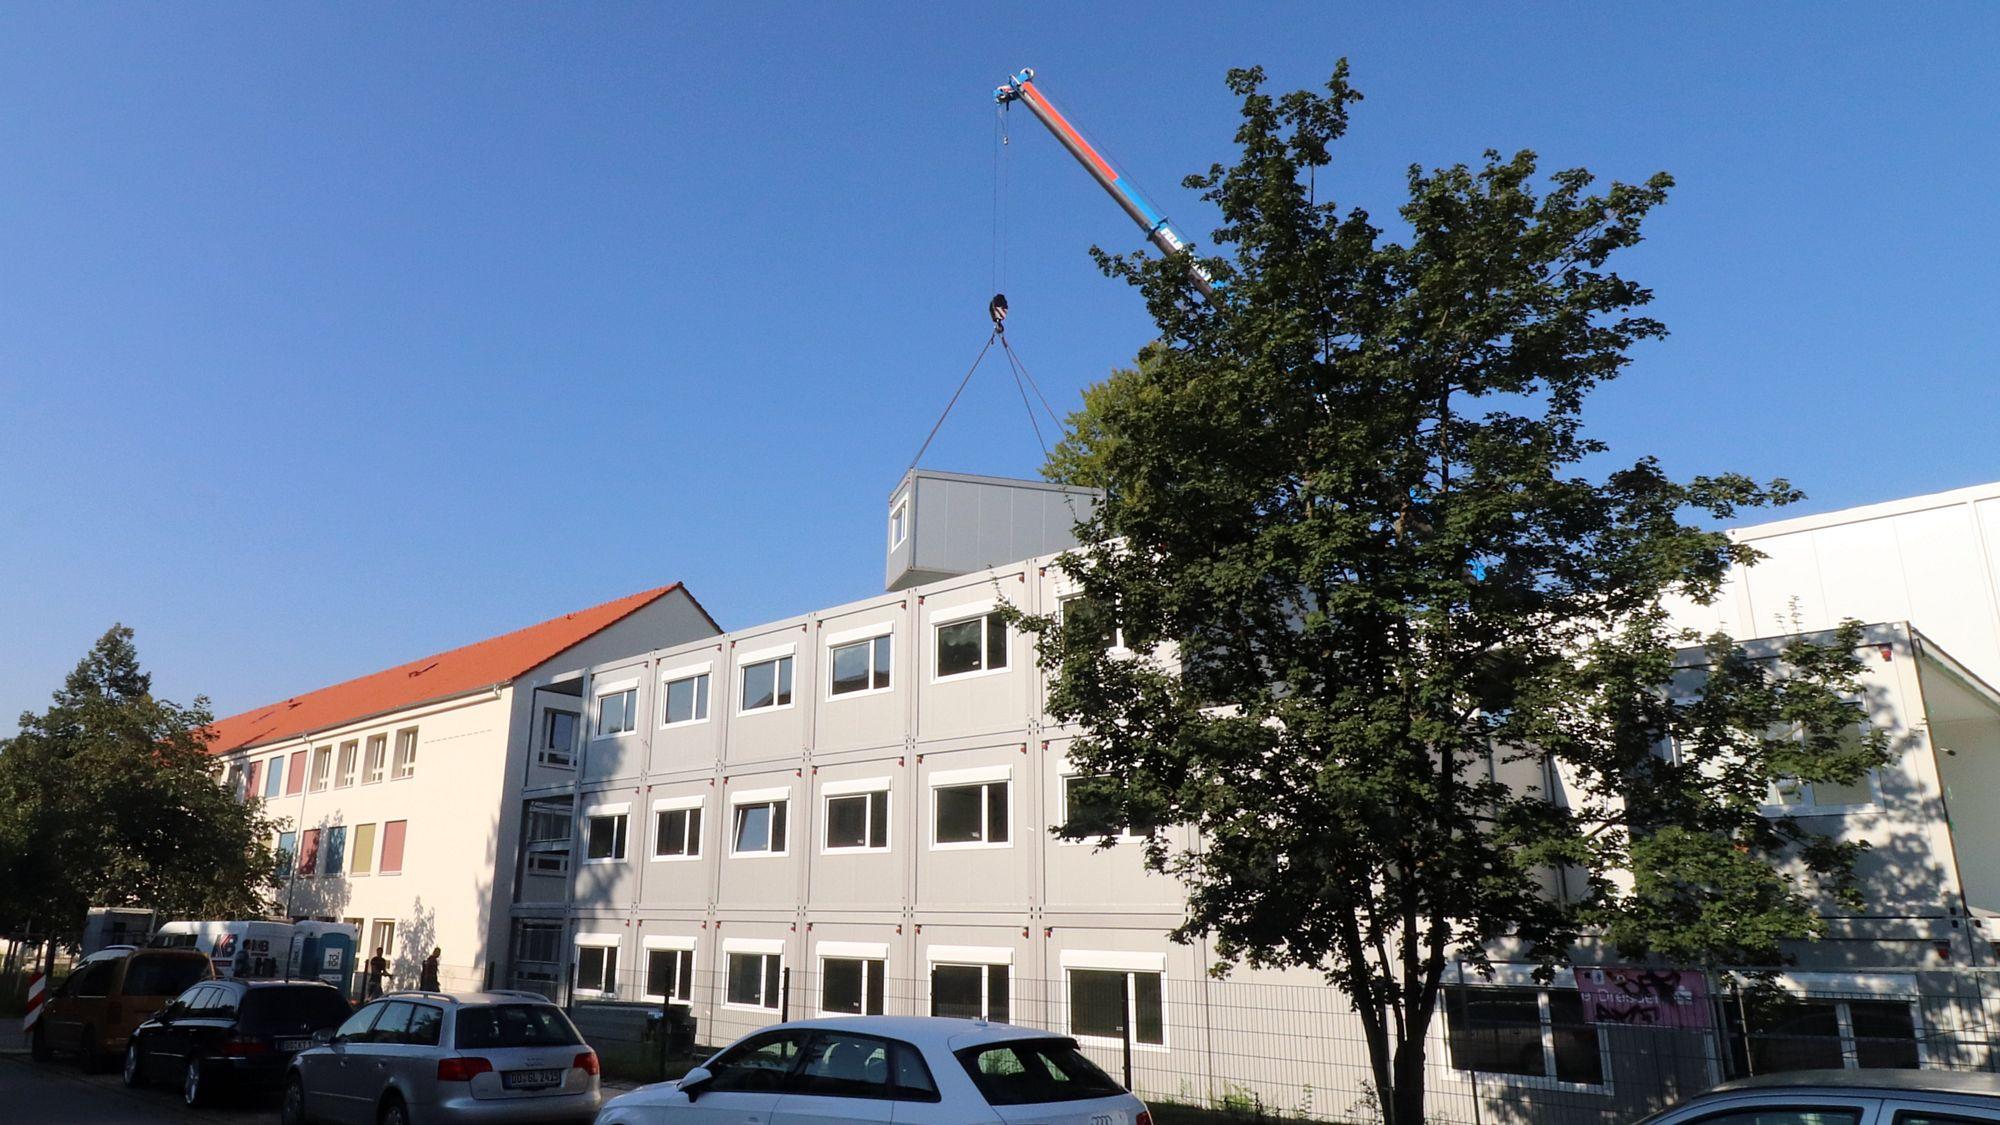 Hechtparkschule fertiggestellt - Container können demontiert werden.